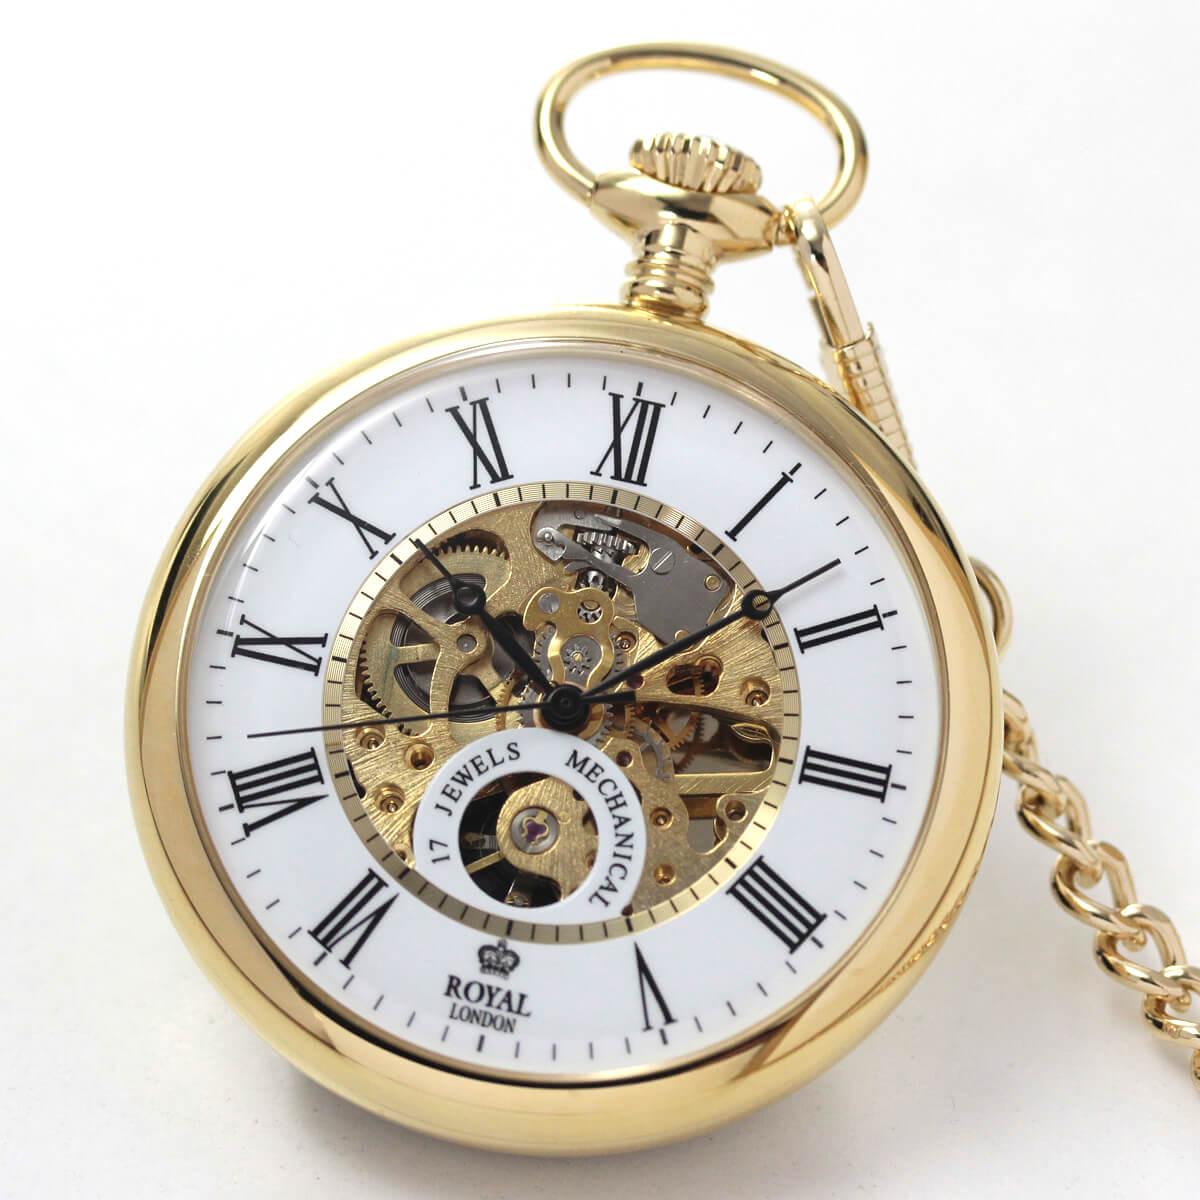 ROYAL LONDON(ロイヤルロンドン) 手巻きスケルトン懐中時計 90049-02